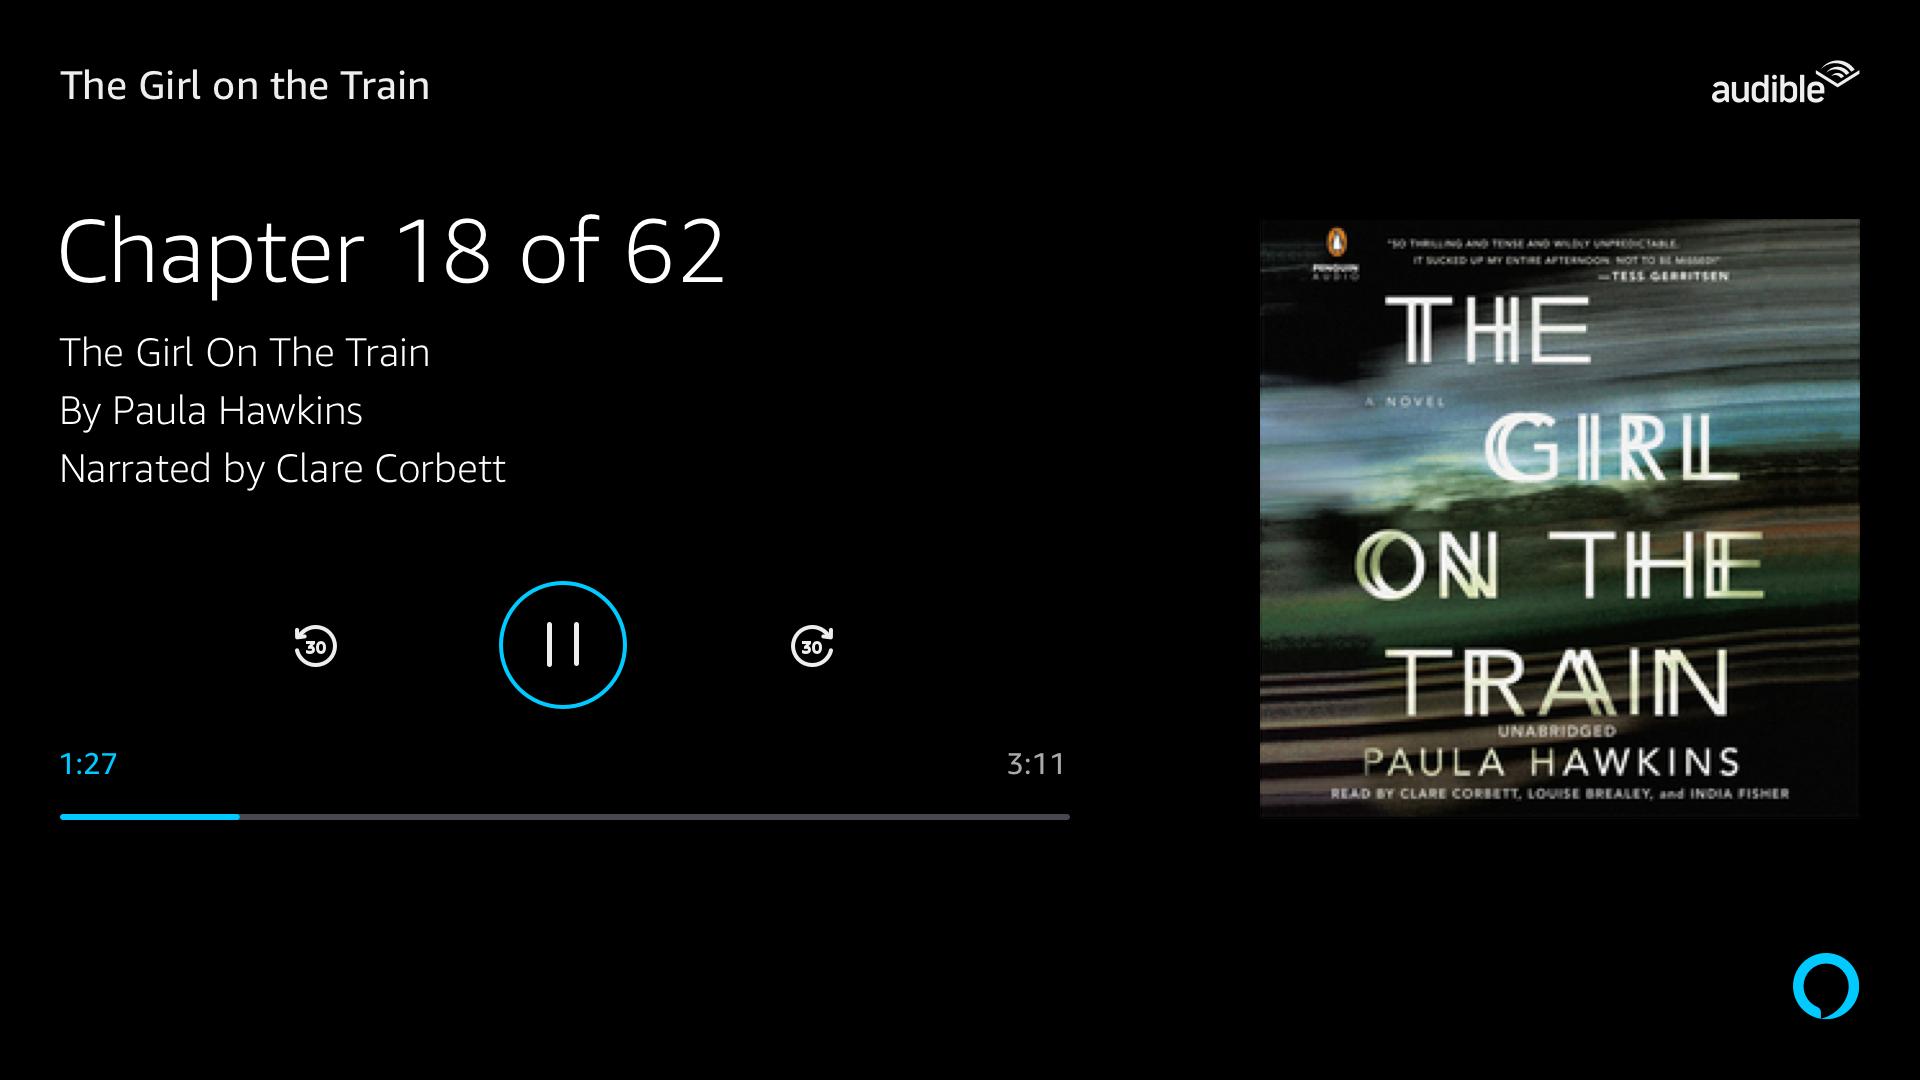 Alexa Display Cards for TV: NowPlaying Amazon Music